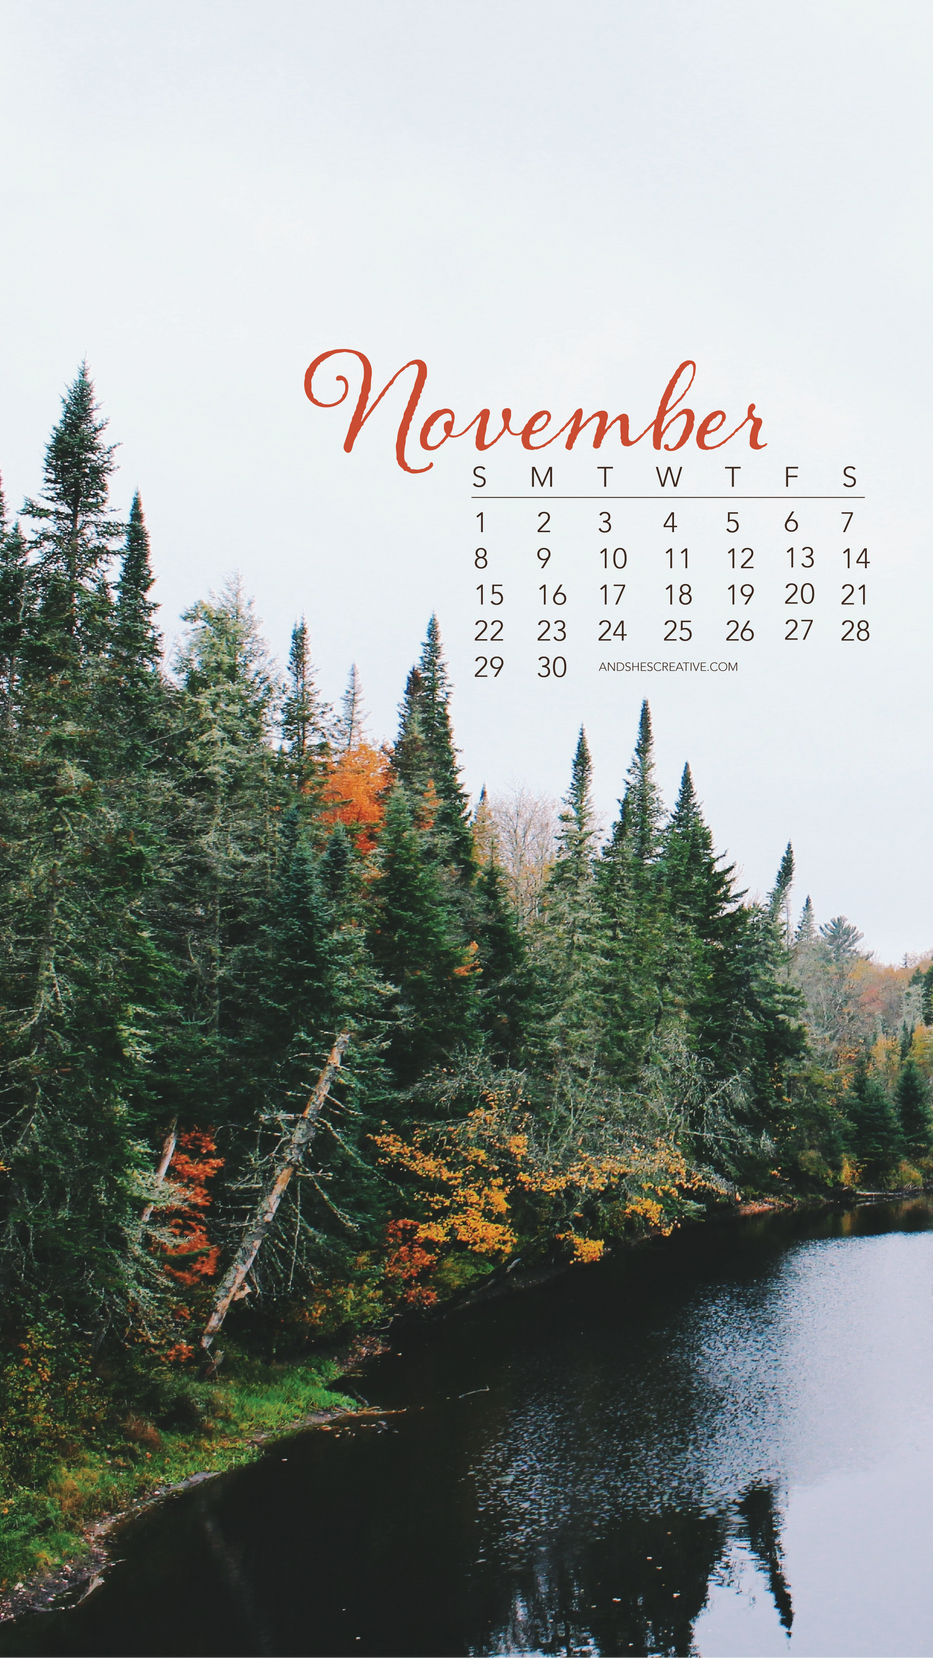 November Fall Mobile Background